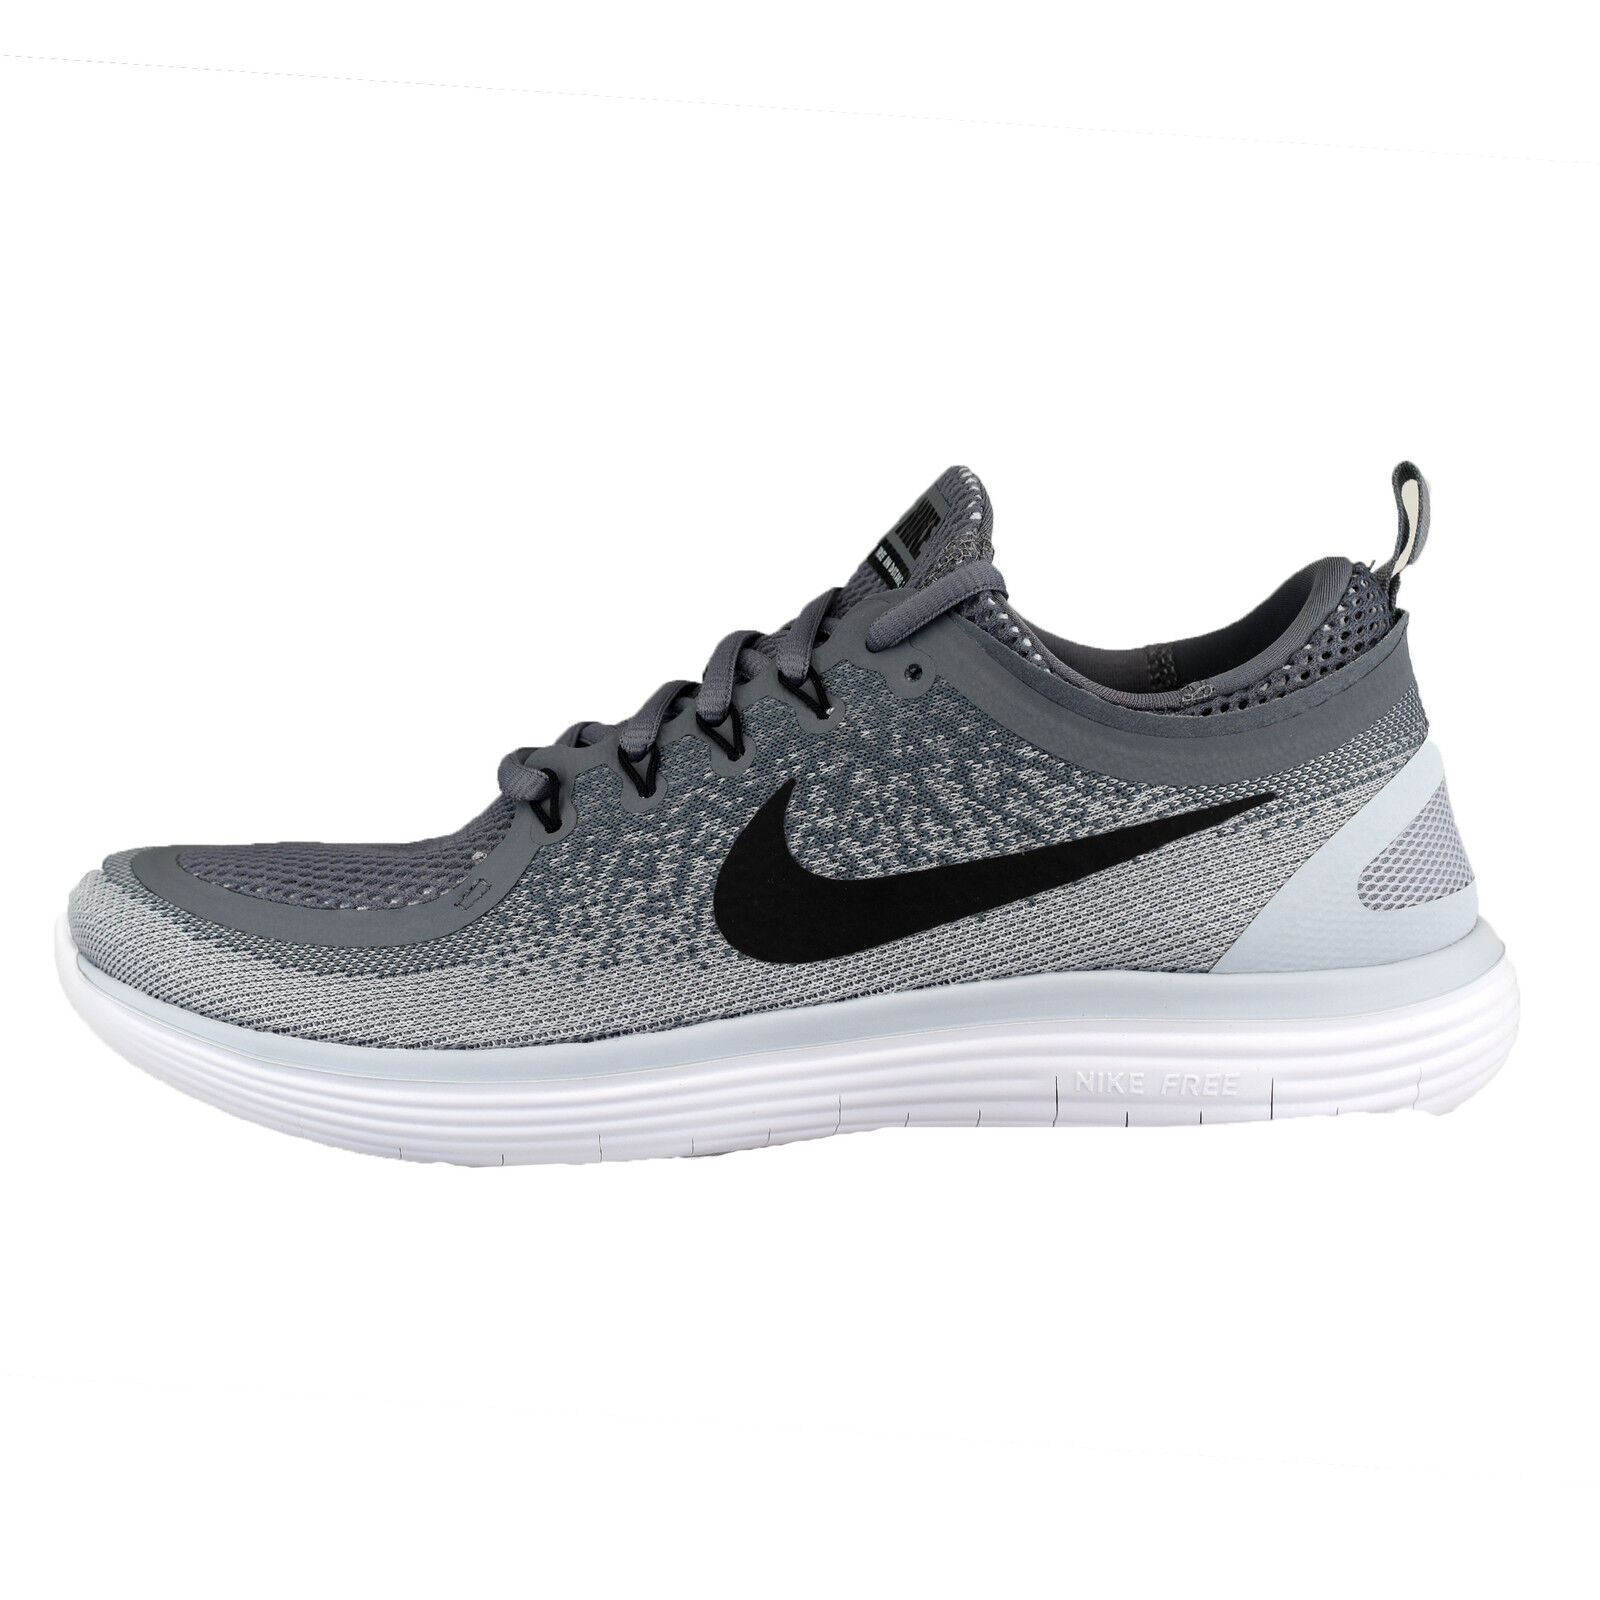 Nike Absente Rn Distance 2 863775-002 Chaussures de Course Baskets Loisirs